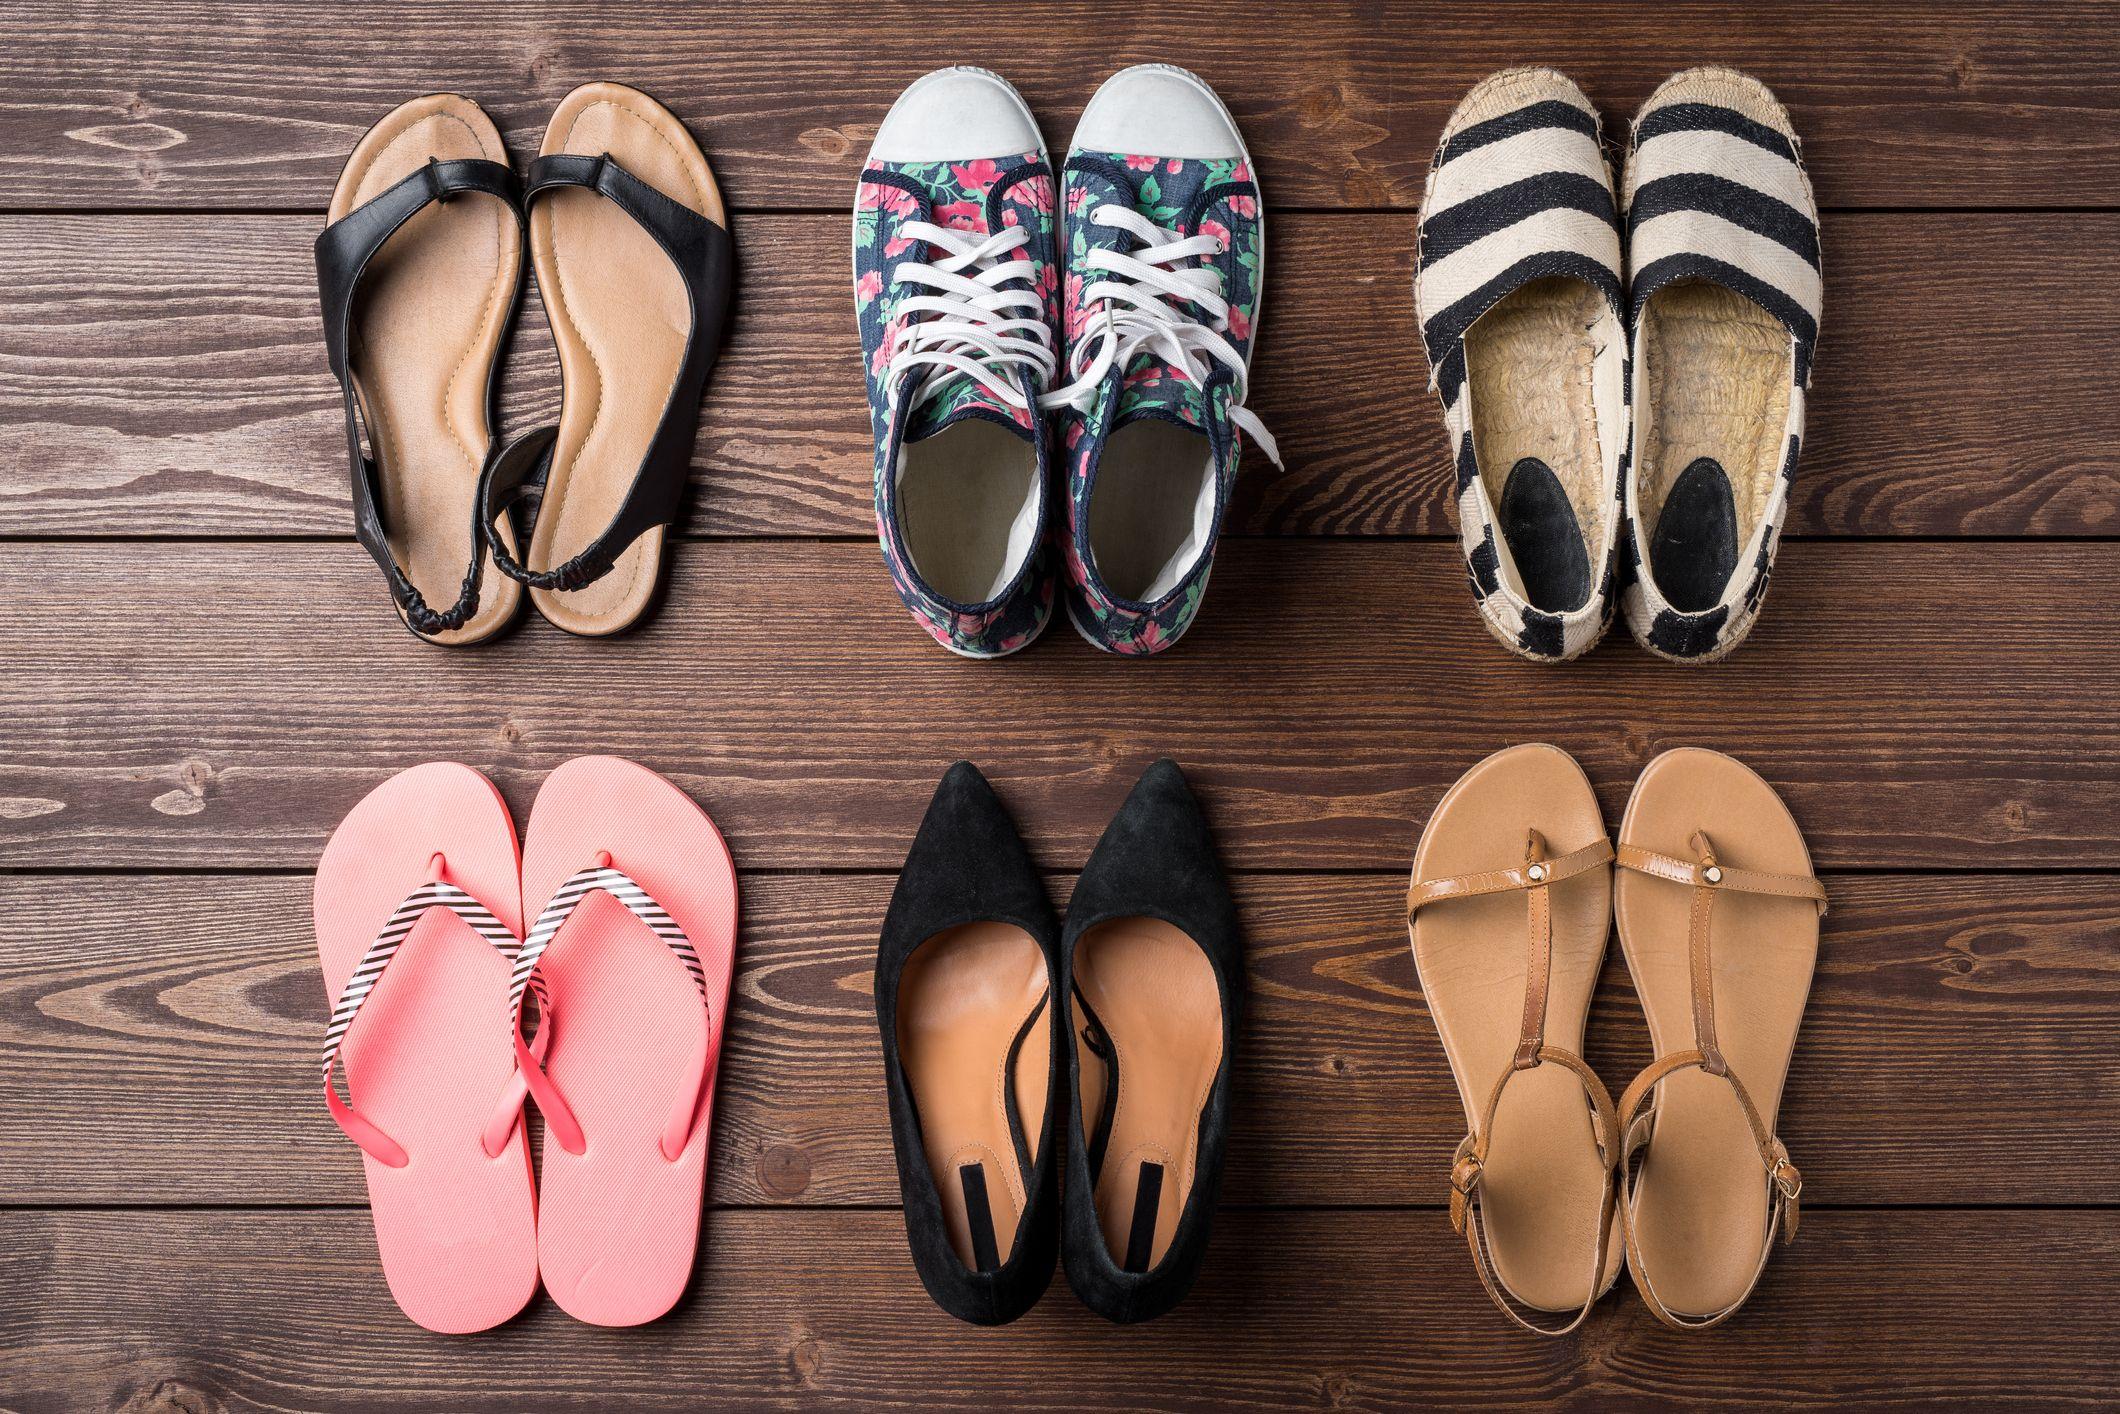 Organizar zapatos de verano